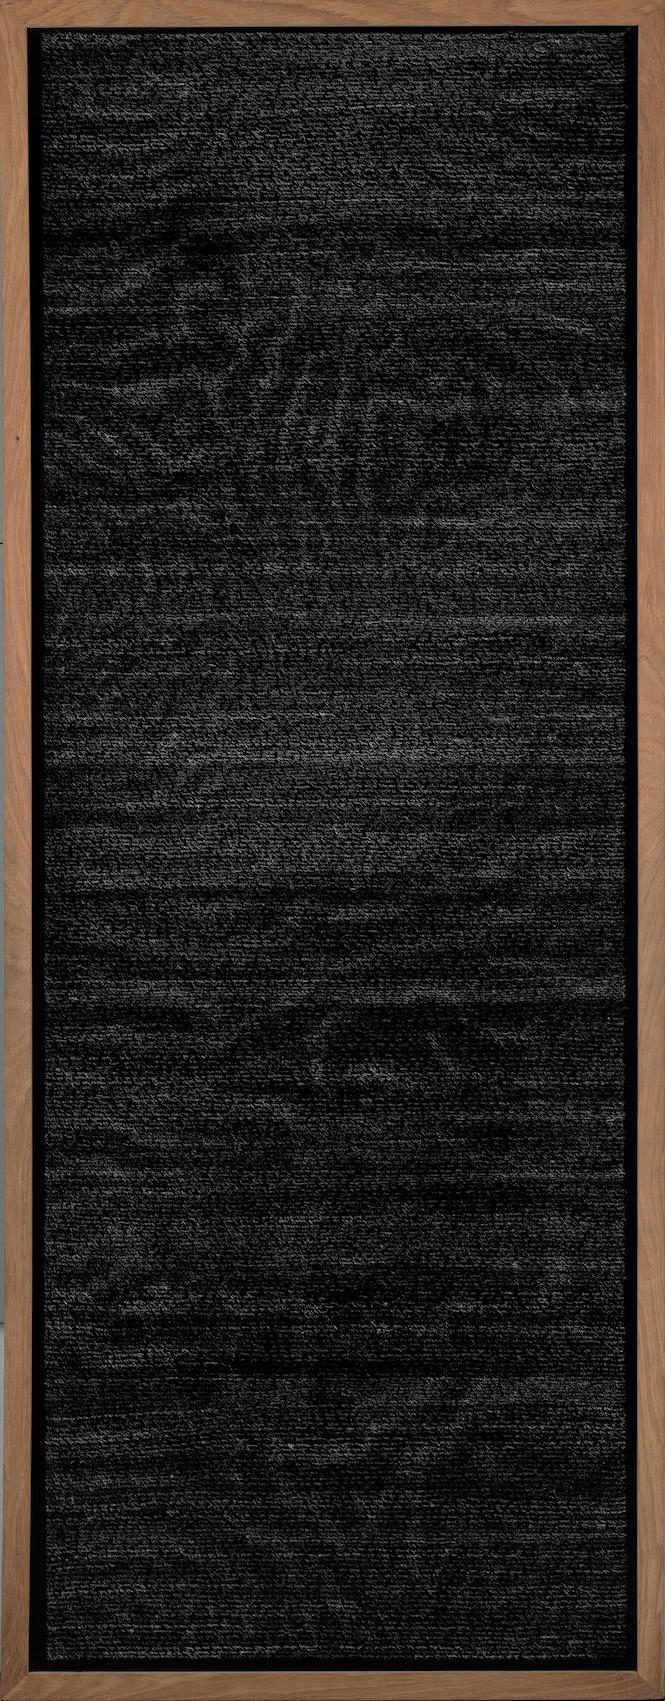 Gegenbild 64x180